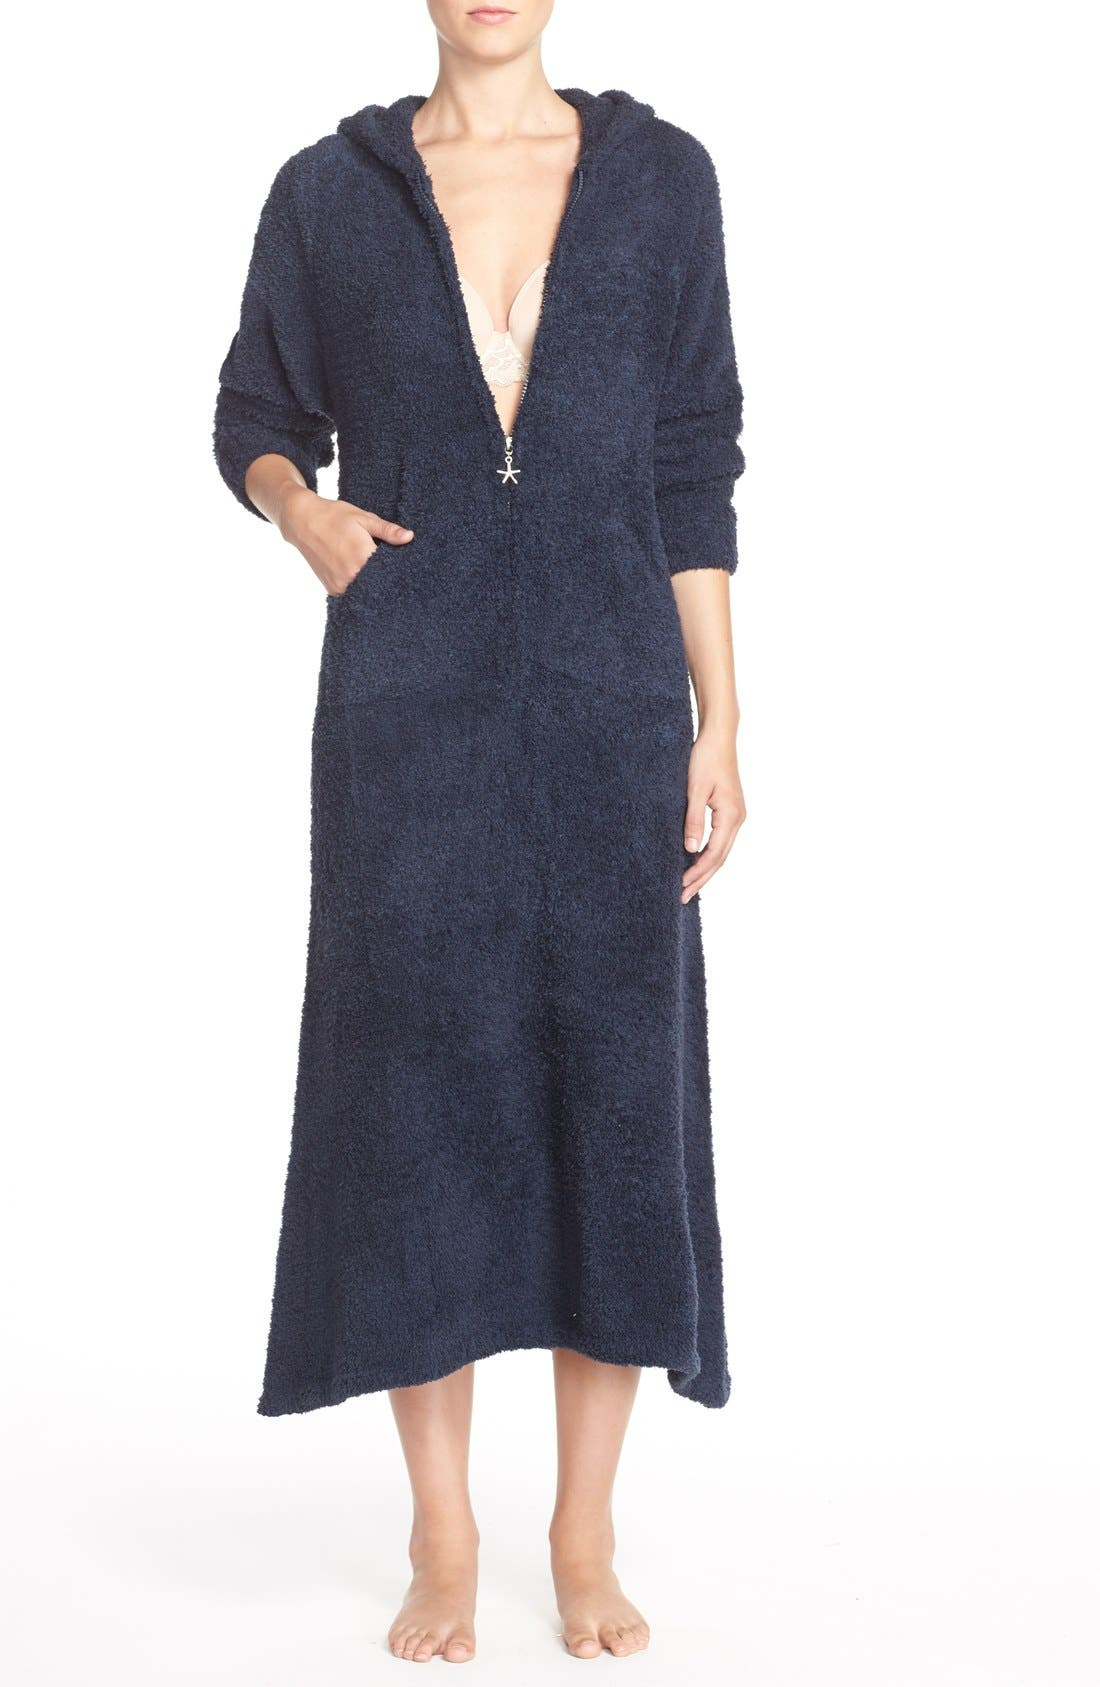 Main Image - Barefoot Dreams® CozyChic® Hooded Zip Robe